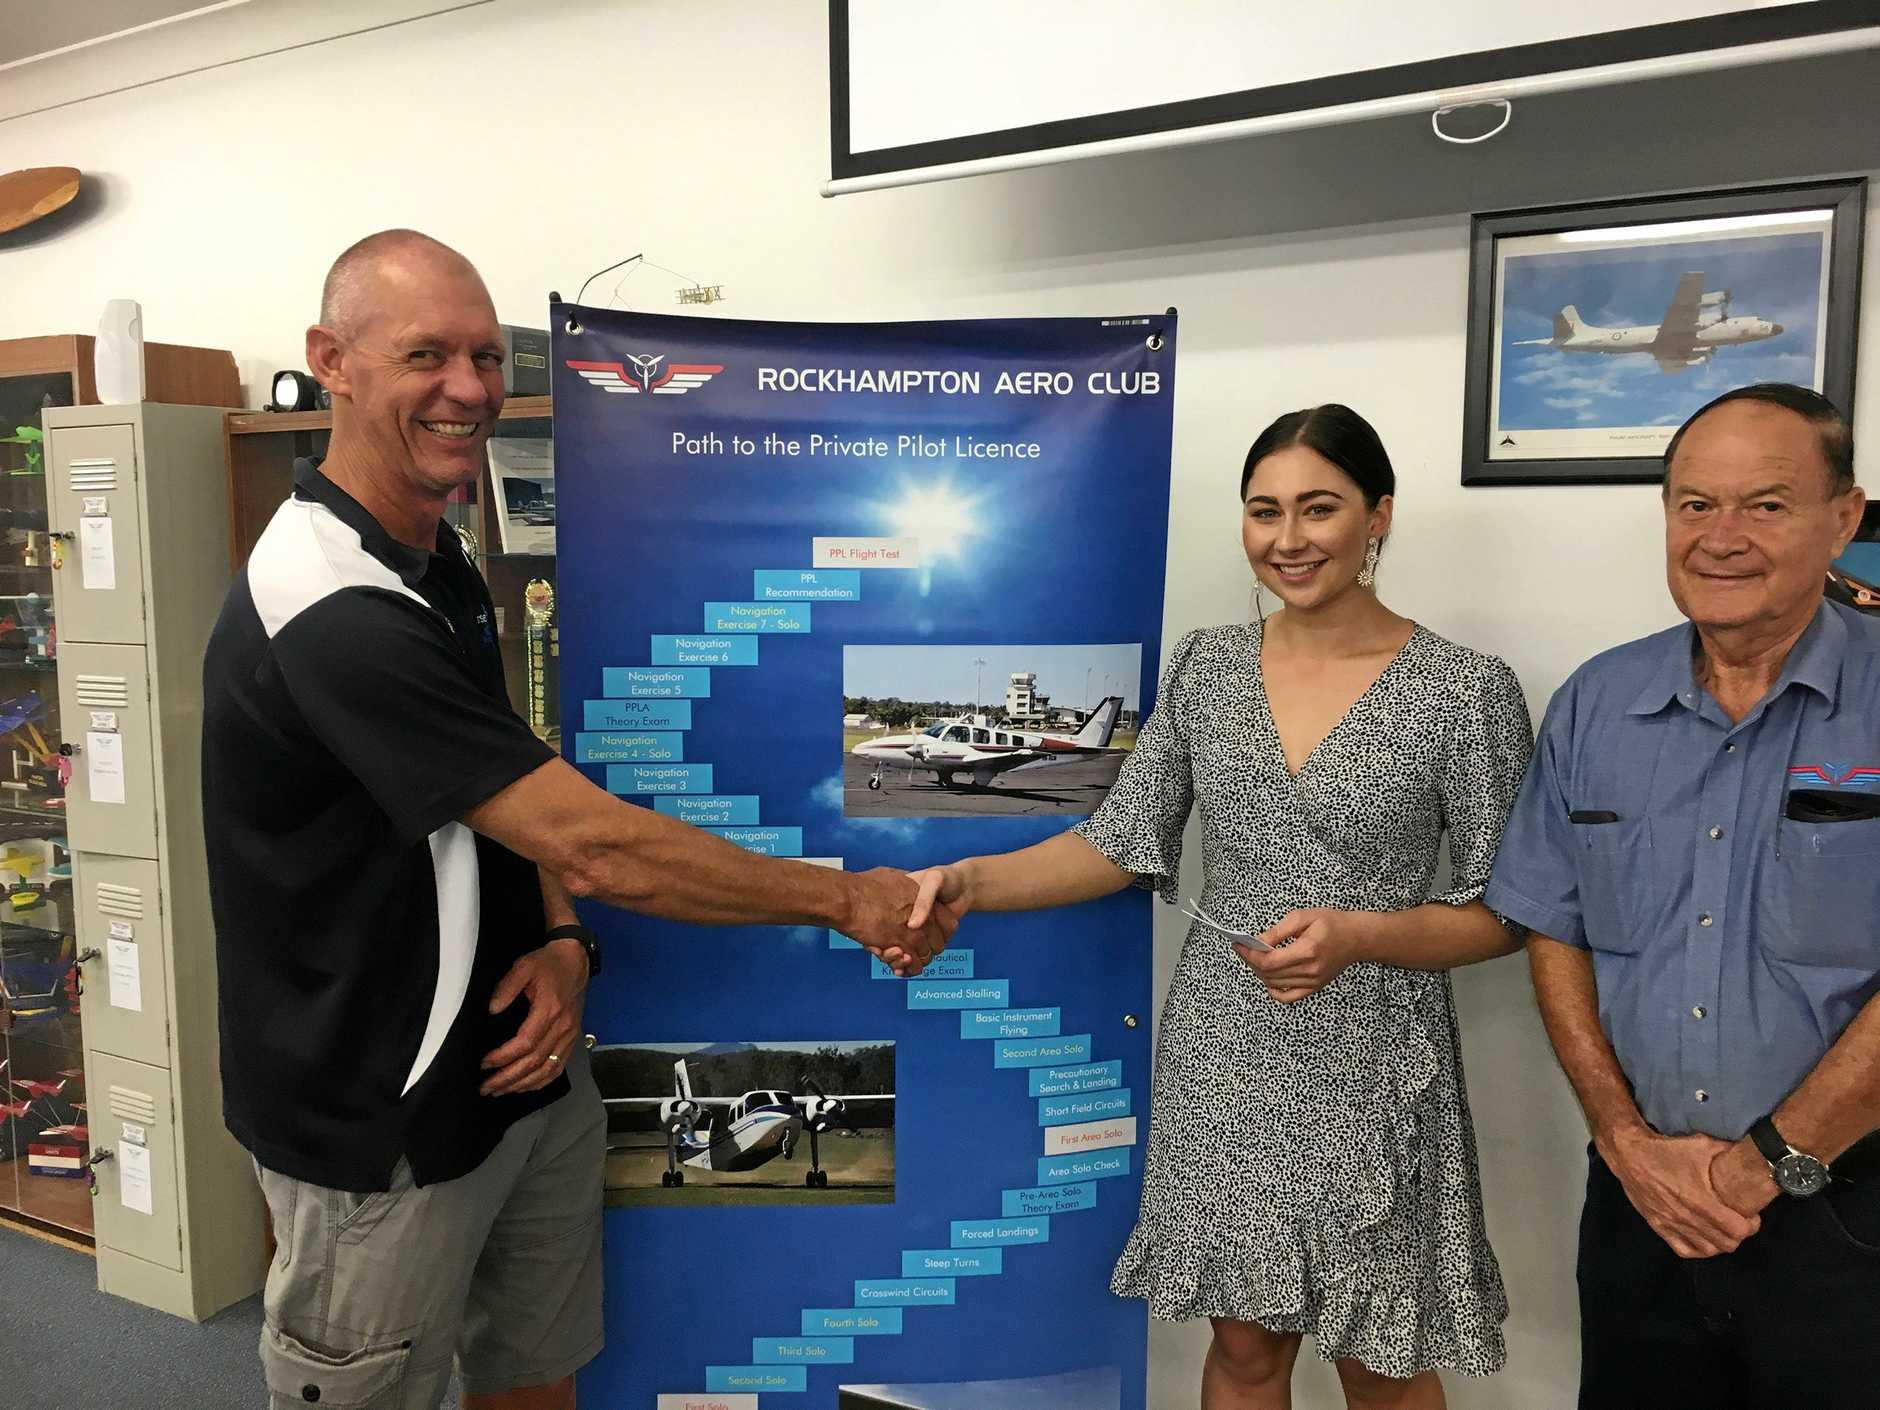 Rob Mitchell from Rockhampton Control Tower/Airservices Australia, Kate Lovegrove and RFACA regional director Graham Dooley at a formal presentation at Rockhampton Aero Club on Friday night.